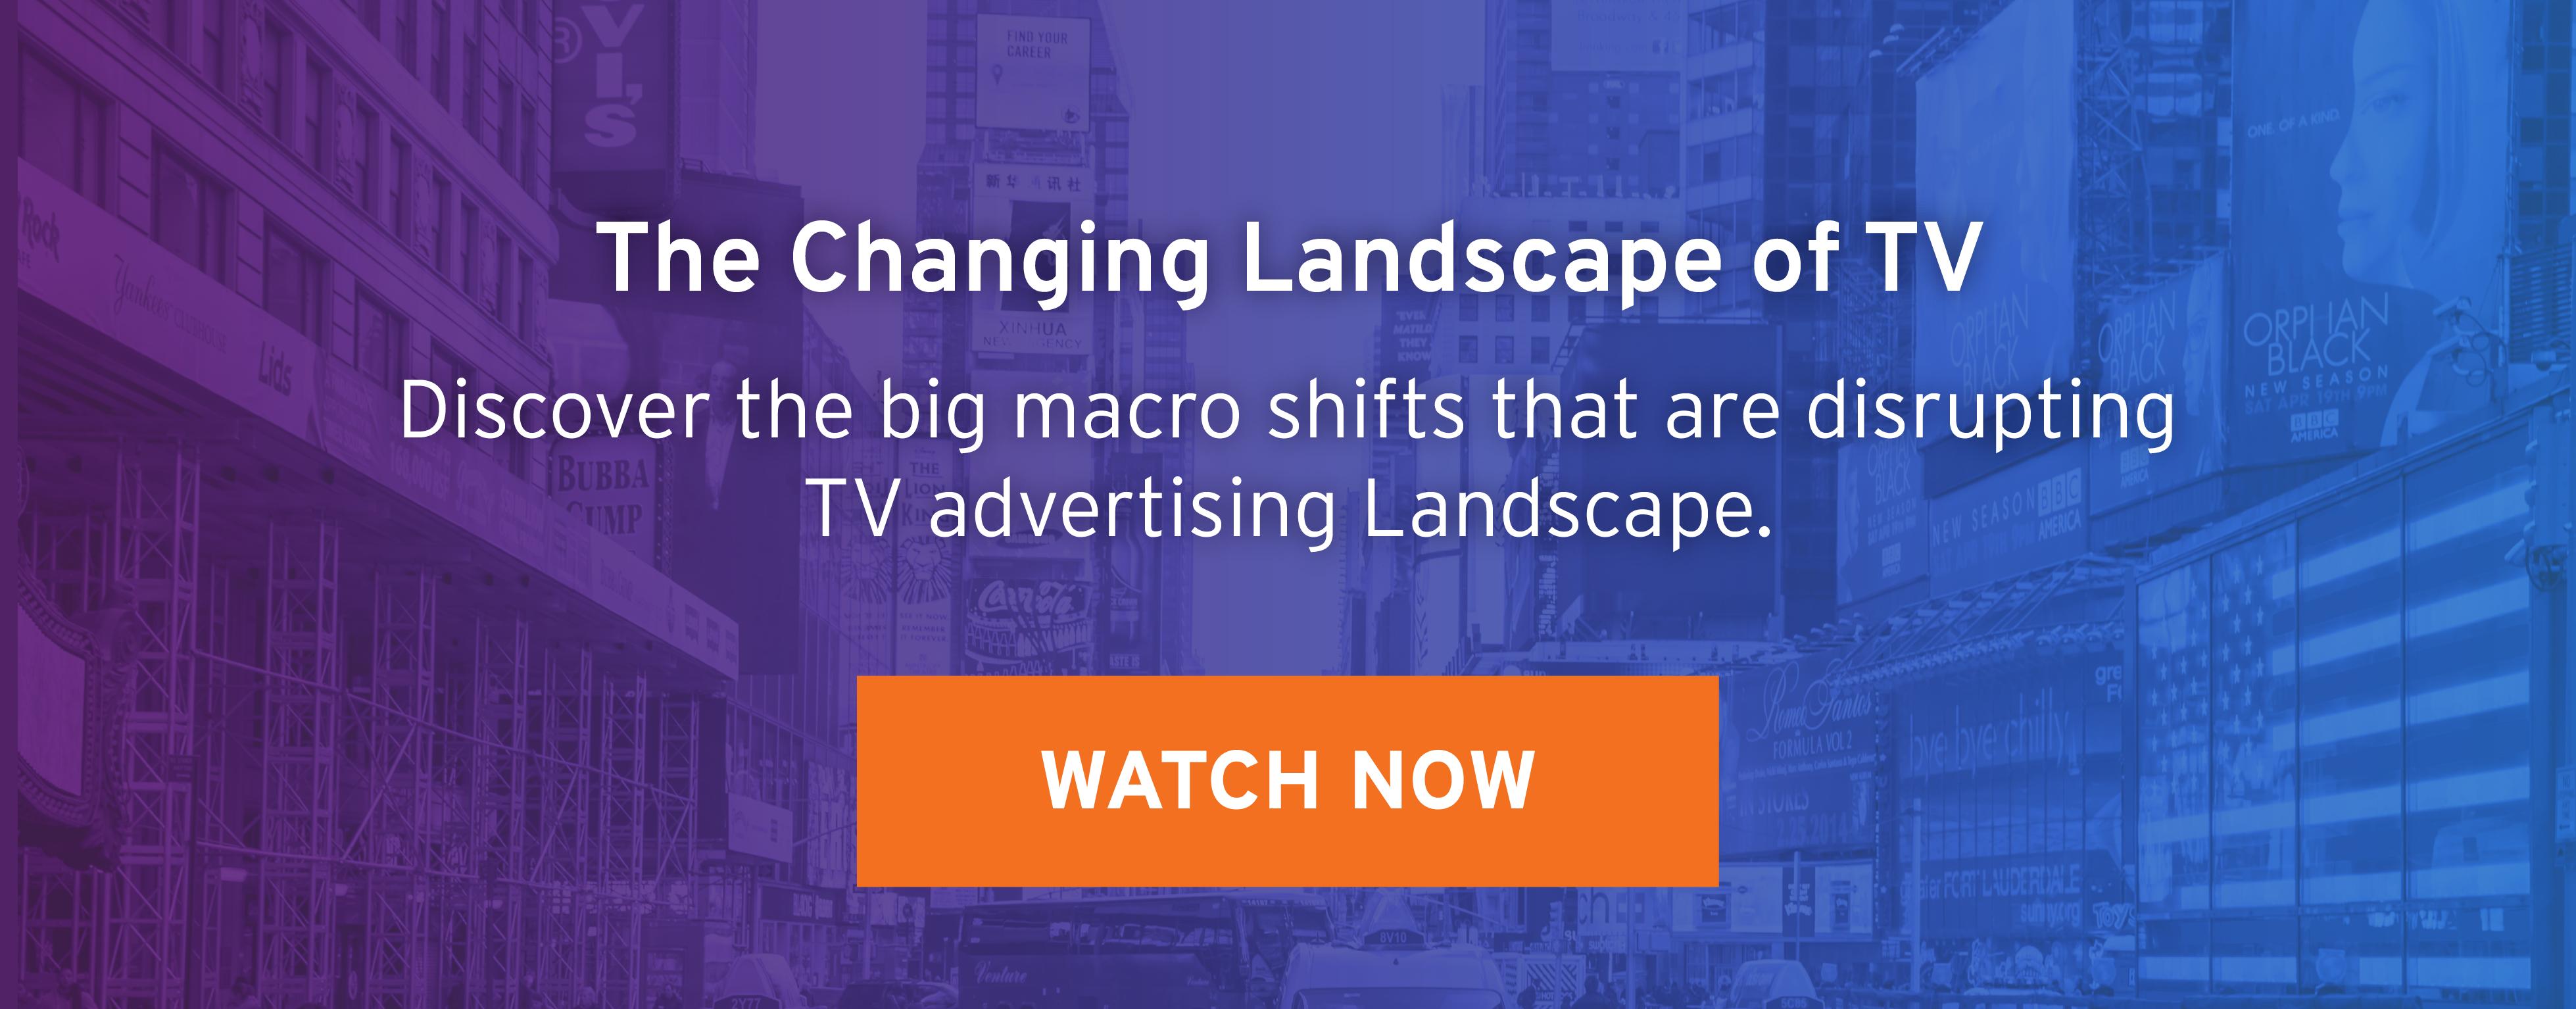 Macro Trends in the TV Landscape